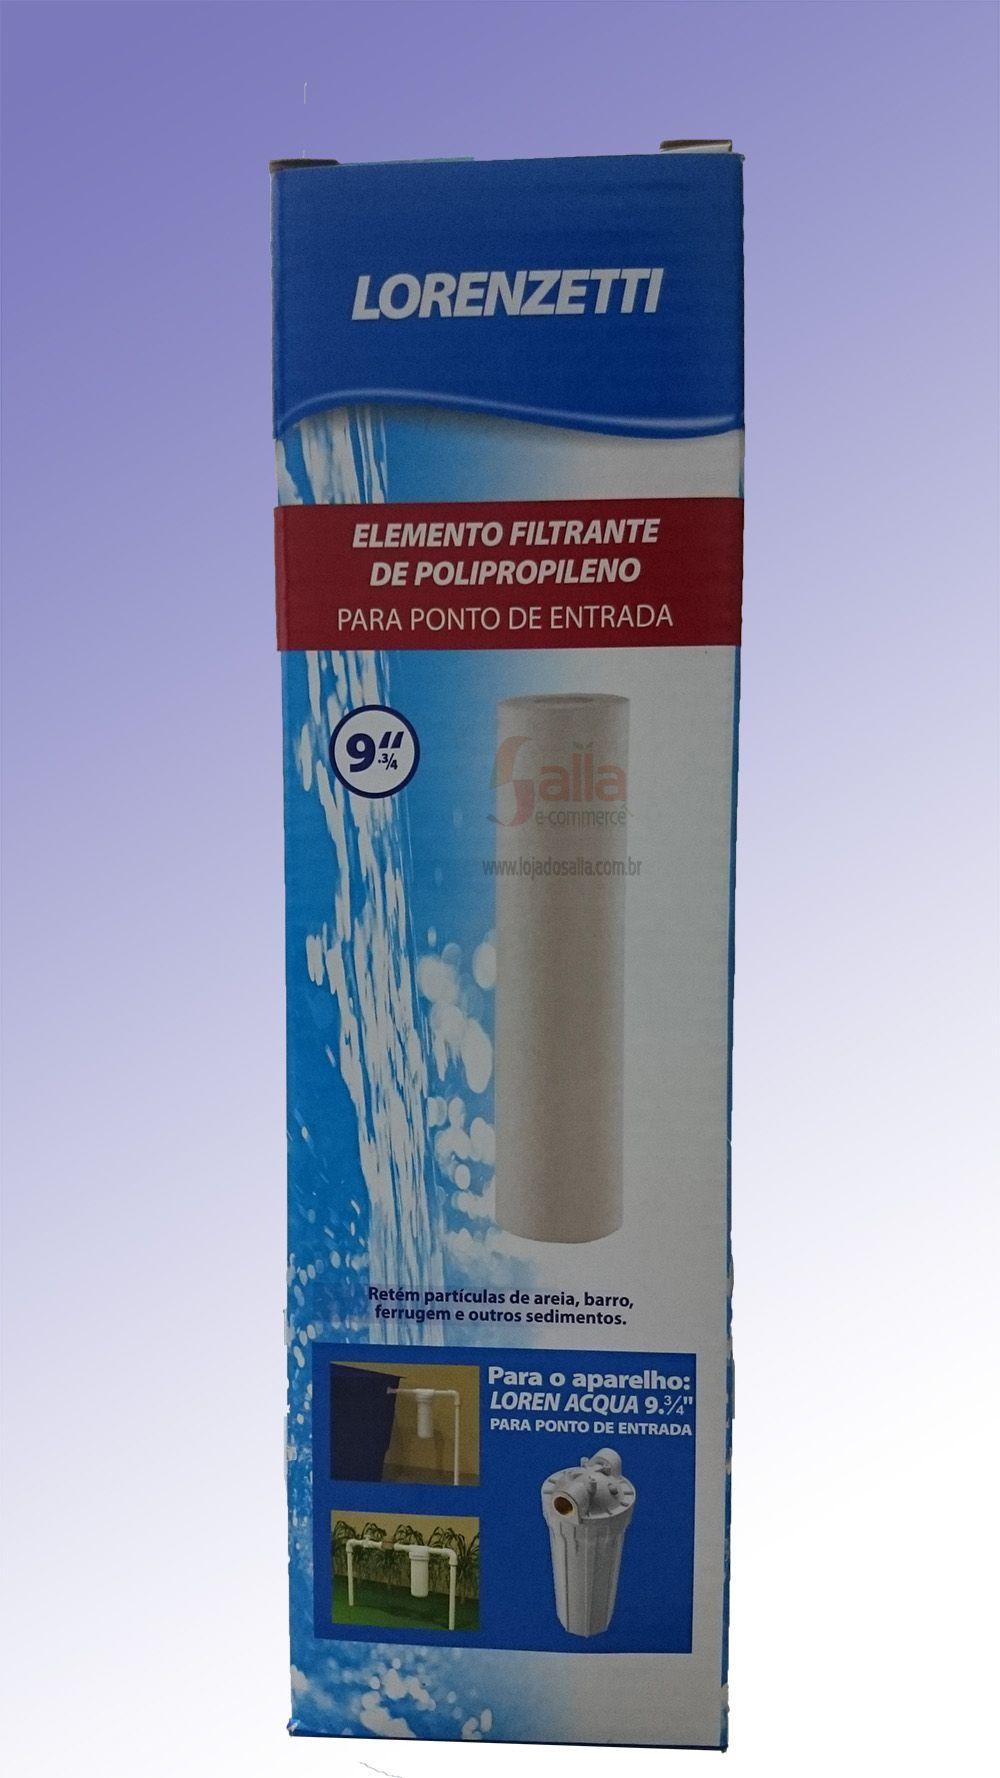 Refil Filtro Elemento Filtrante p/ Loren Acqua 9 3/4 Pol Polipropileno Lorenzetti Ponto de Entrada